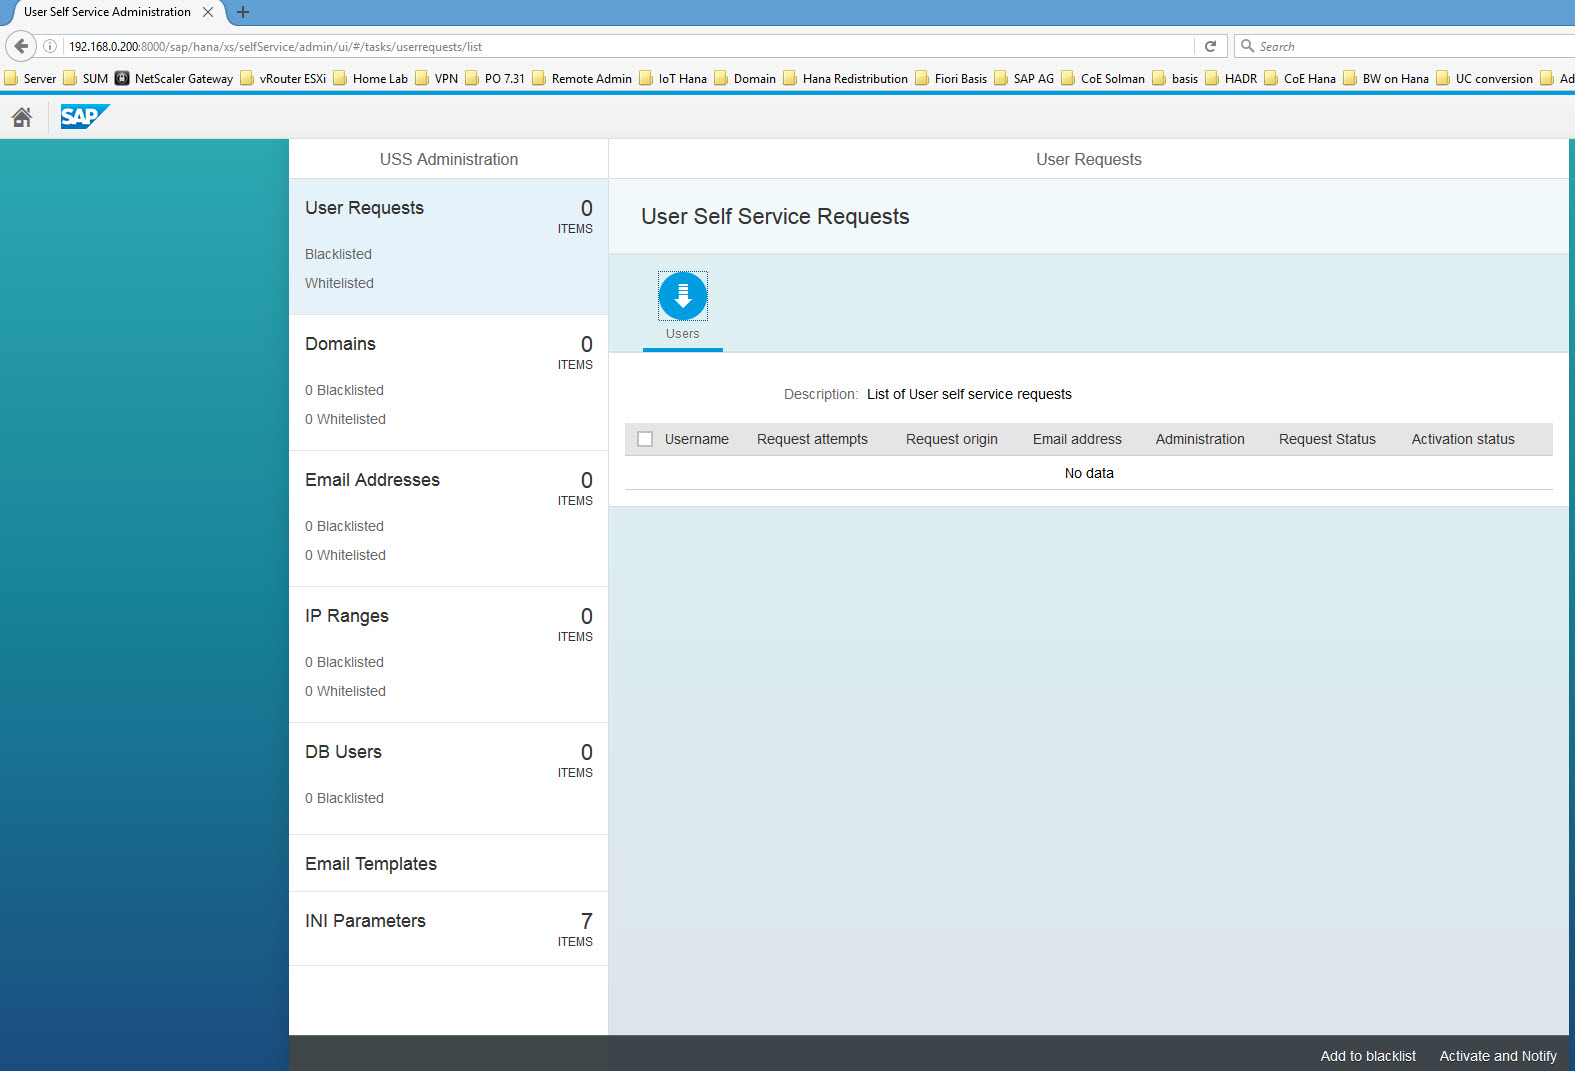 SAP Hana User Self-Service Configuration | SAP Blogs